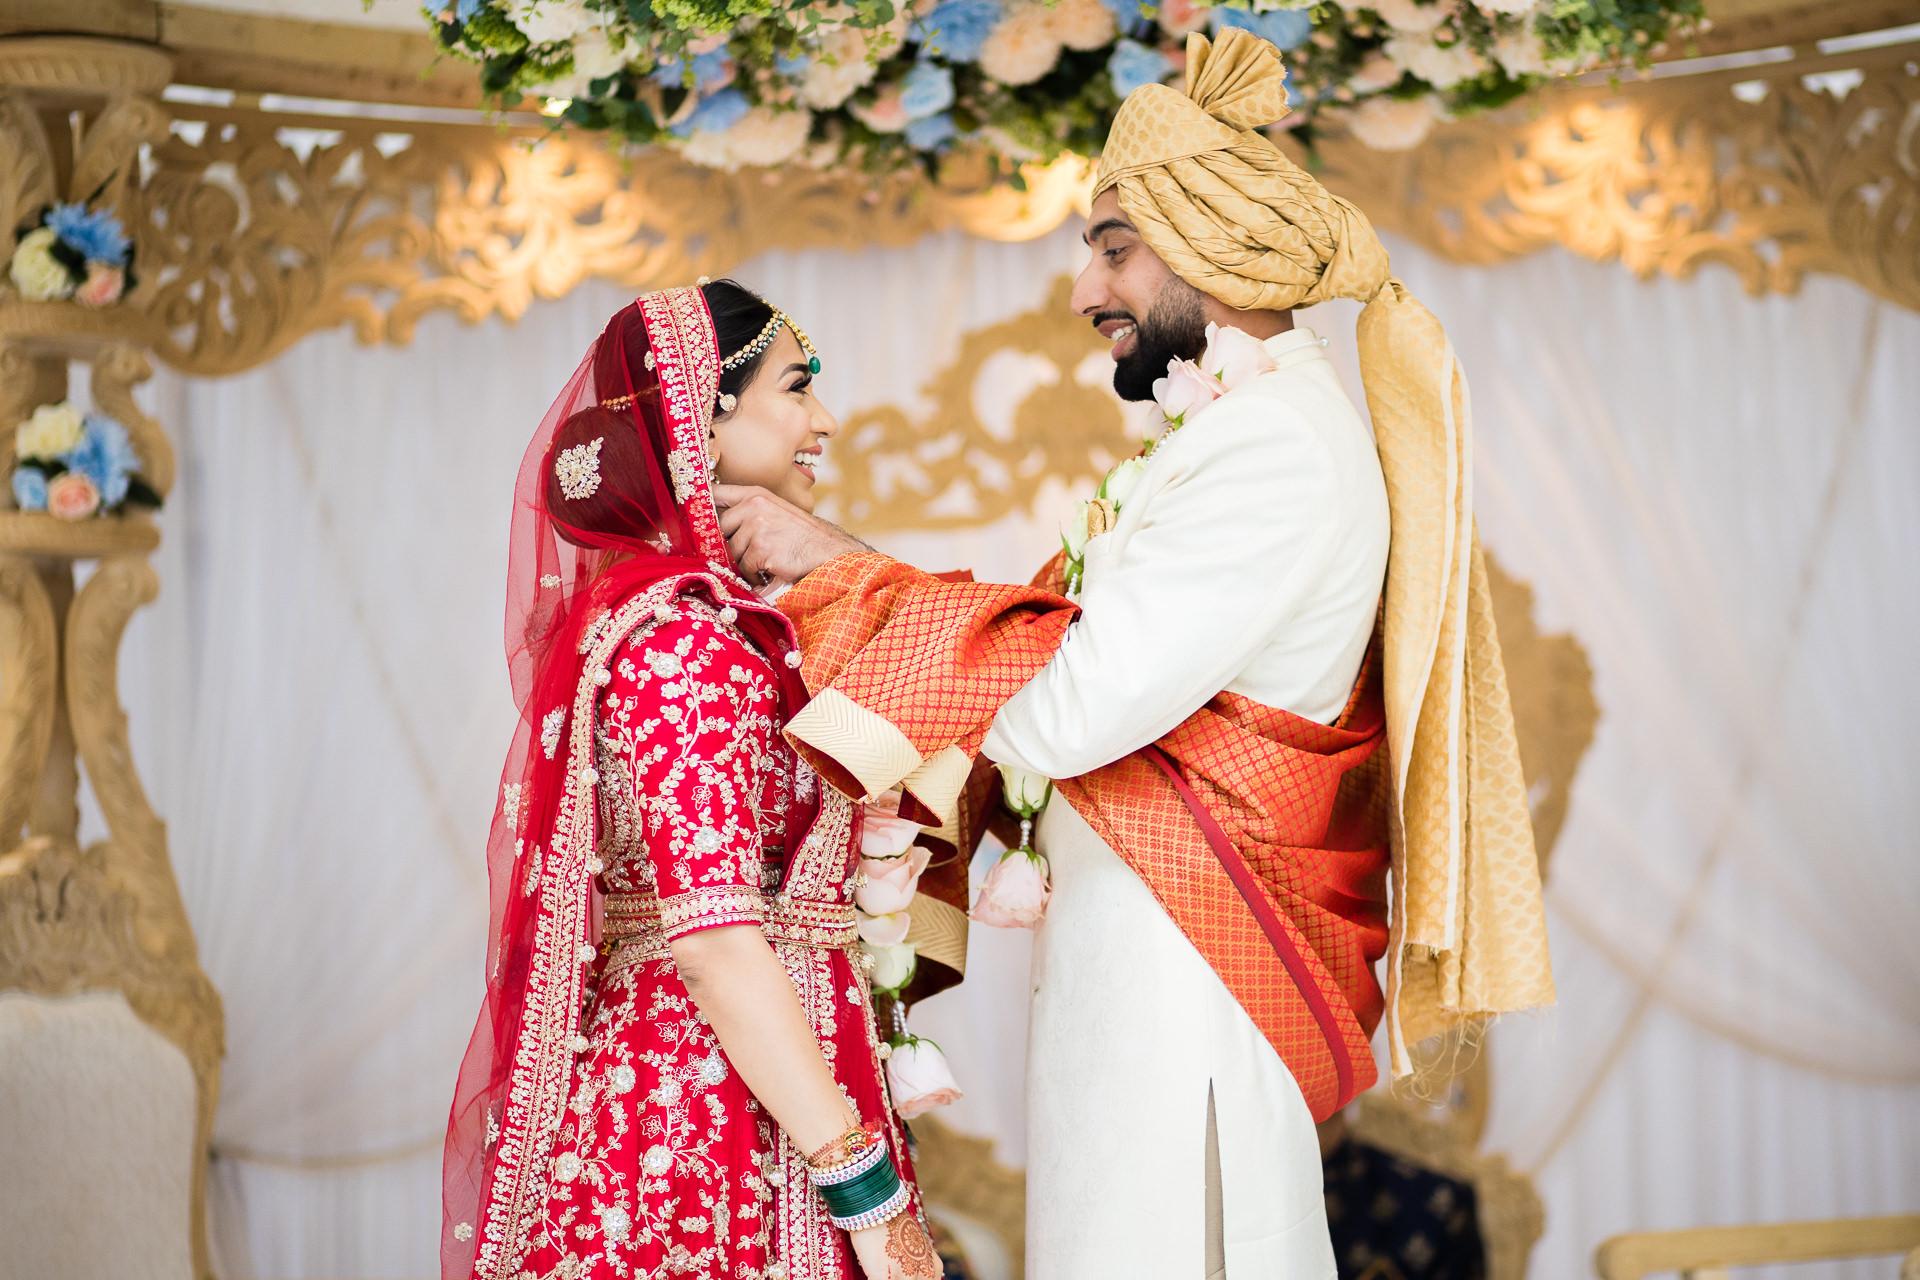 Hindu wedding garlanding ceremony